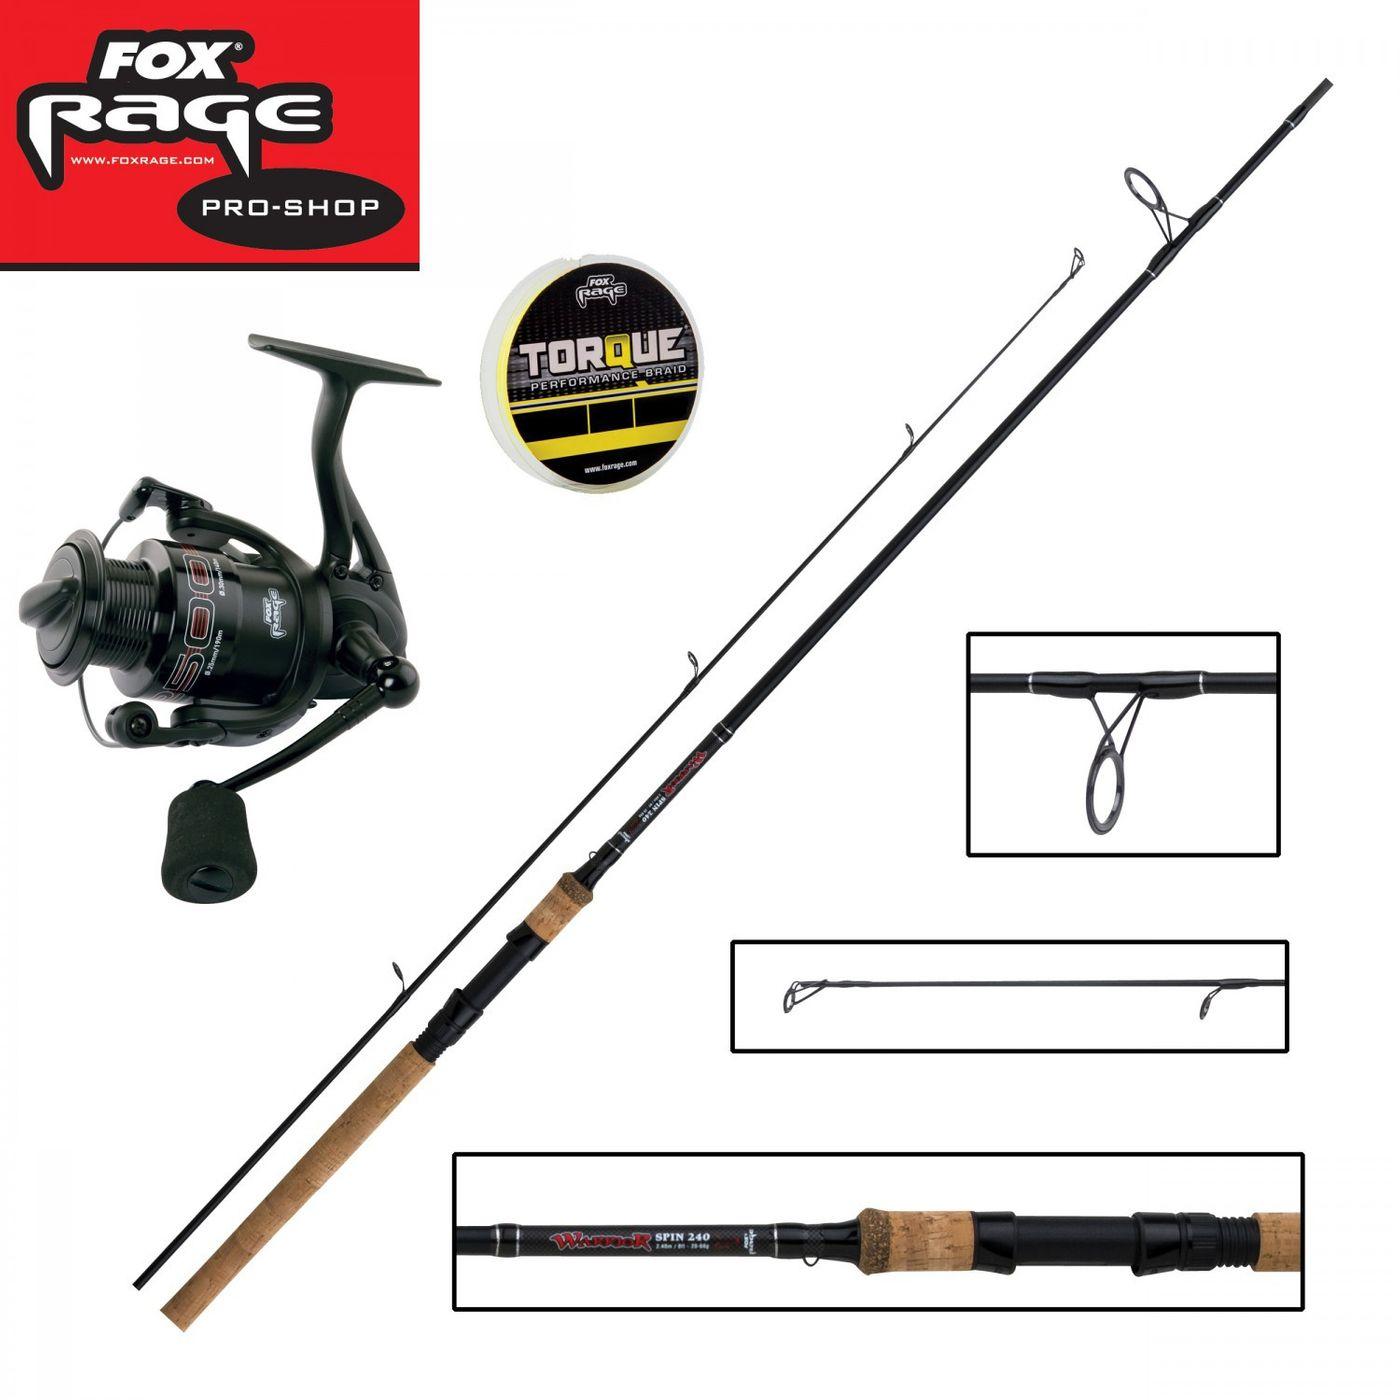 Fox Rage Angelrute Spinnrute Warrior 2 Spin 2,40m 15-50g 2 Teile